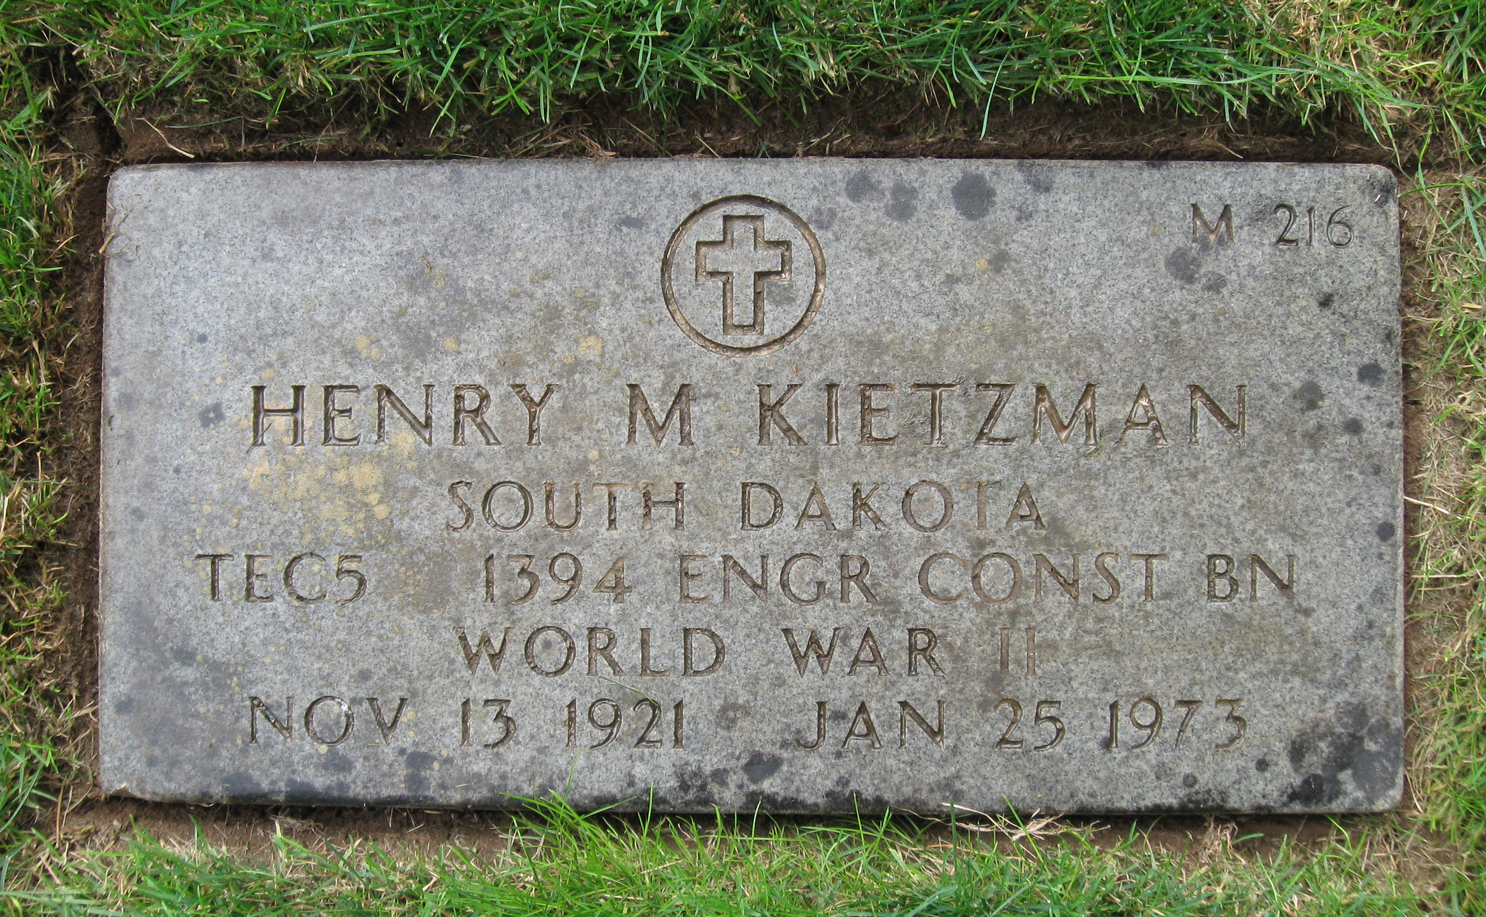 Henry M Kietzman